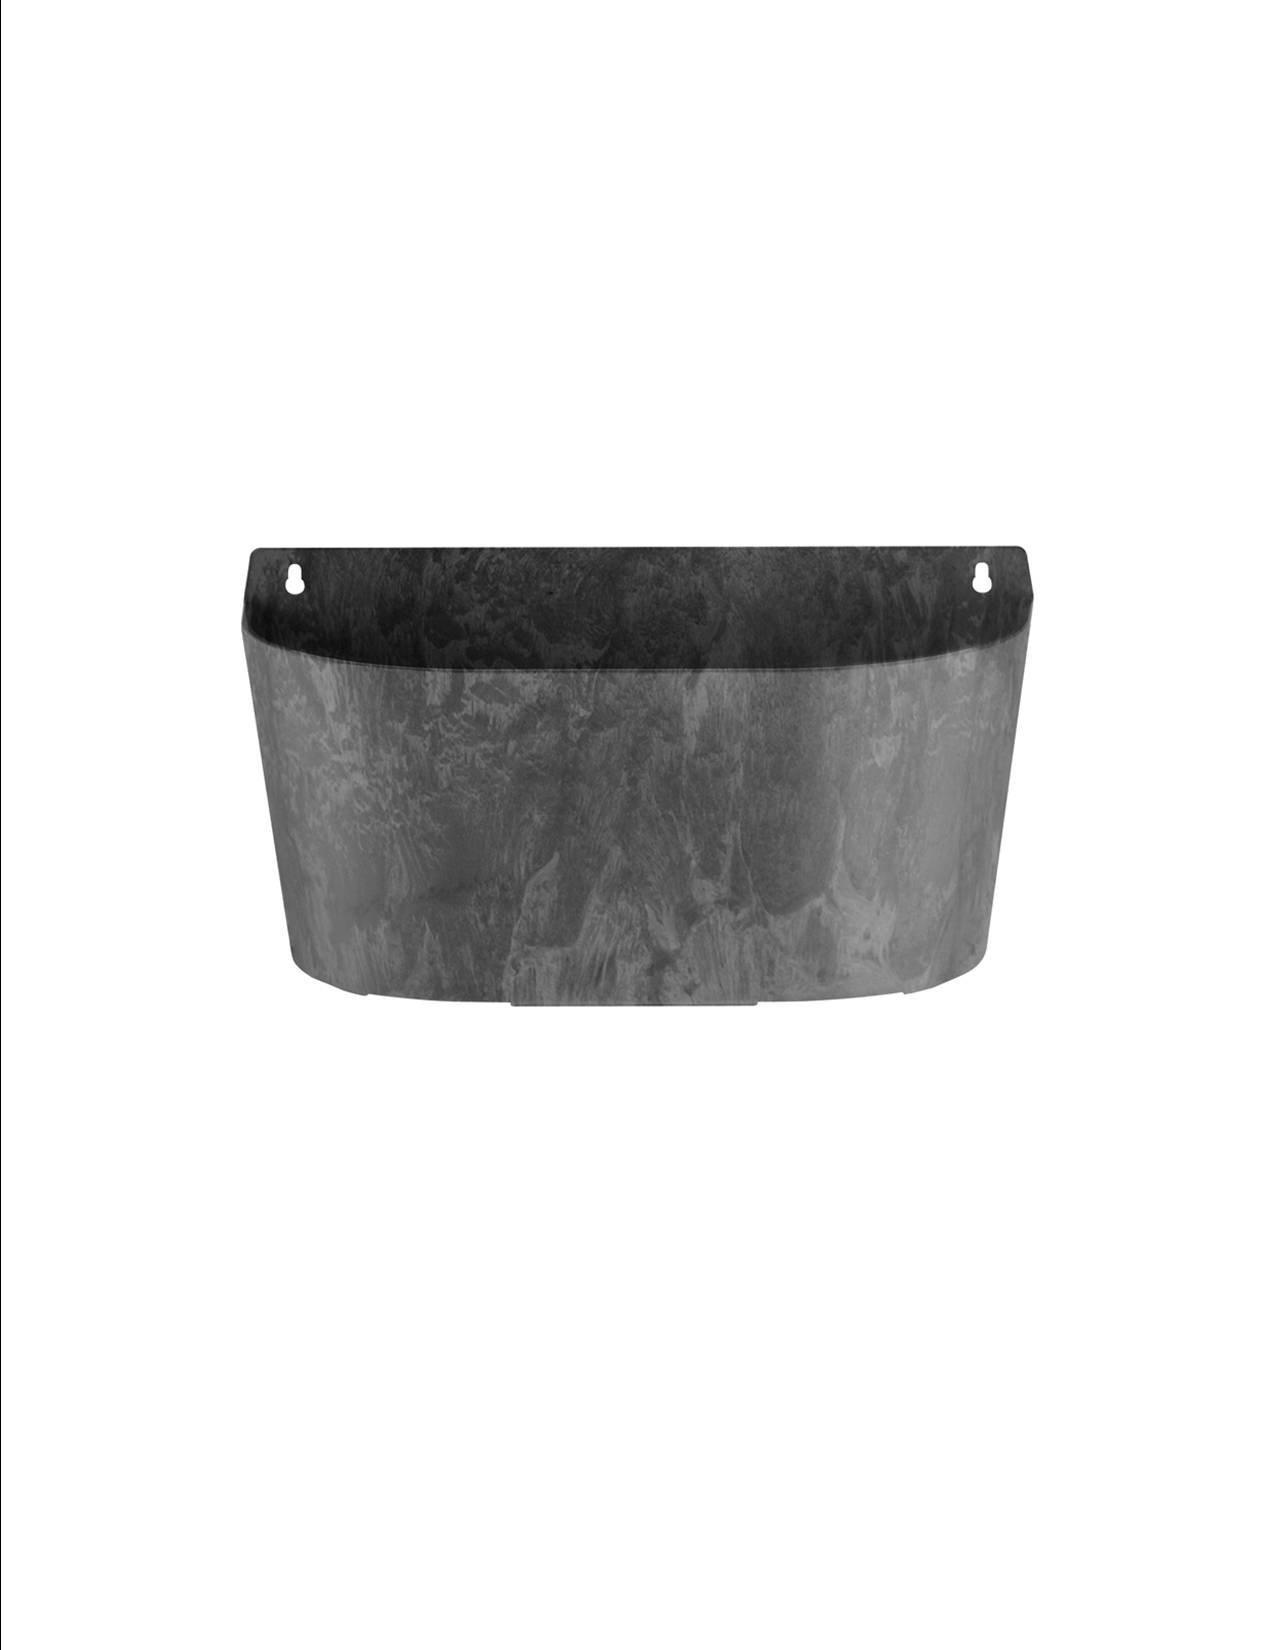 ArtStone Napa Wall Pot, Black, 15.5-Inch